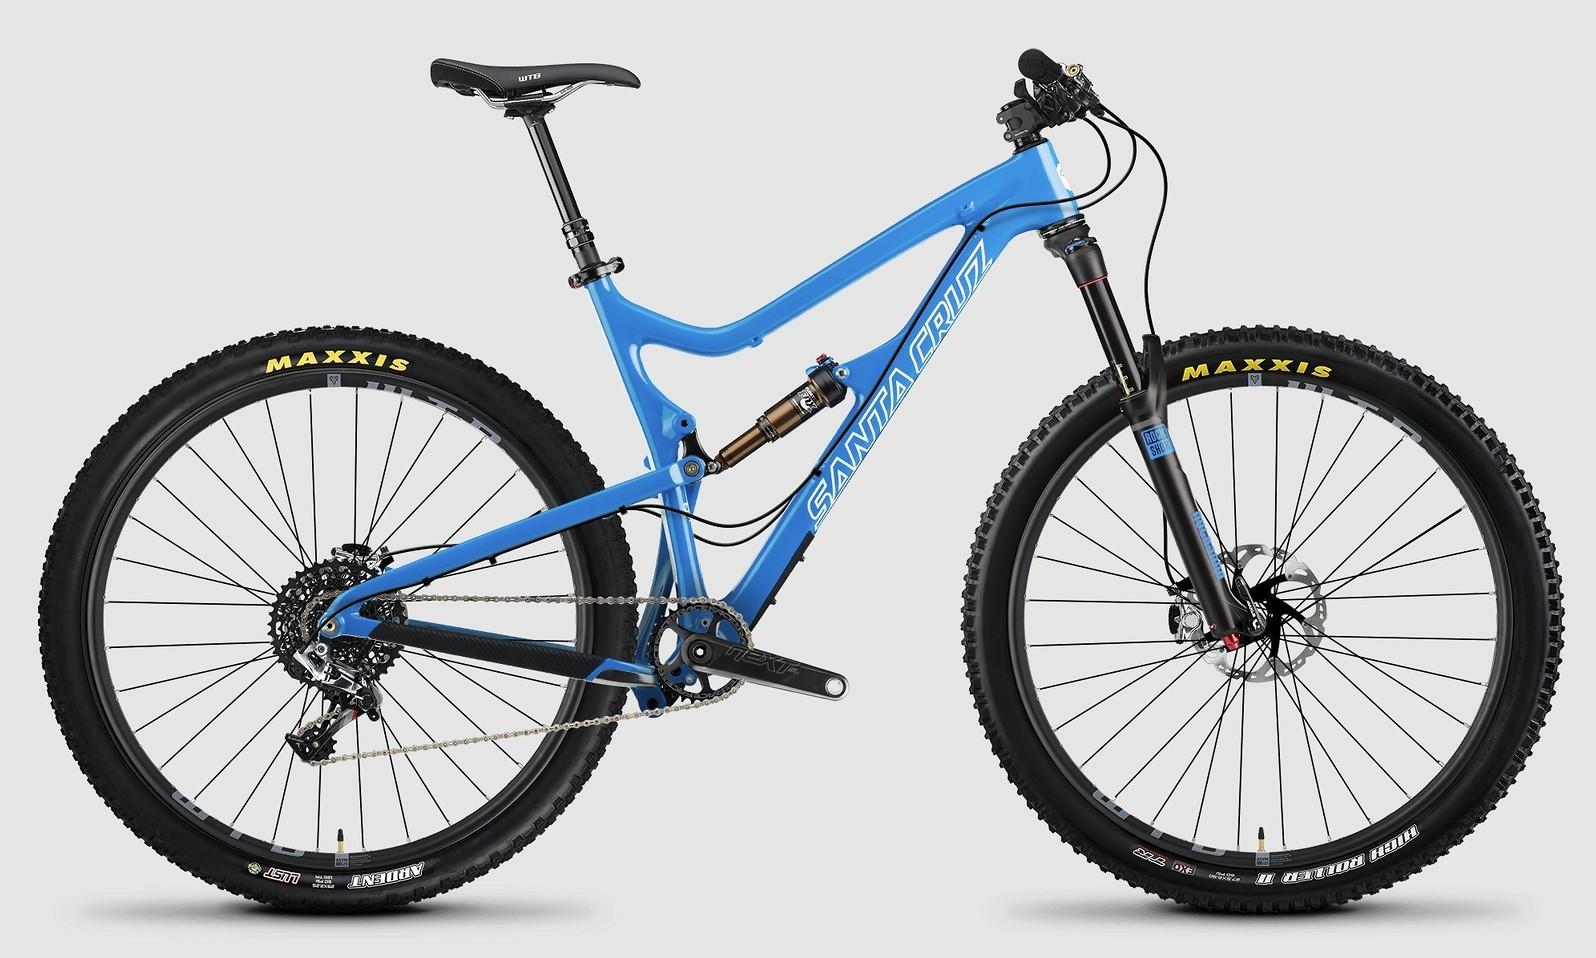 2015 Santa Cruz Tallboy LT Carbon C XX1 bike